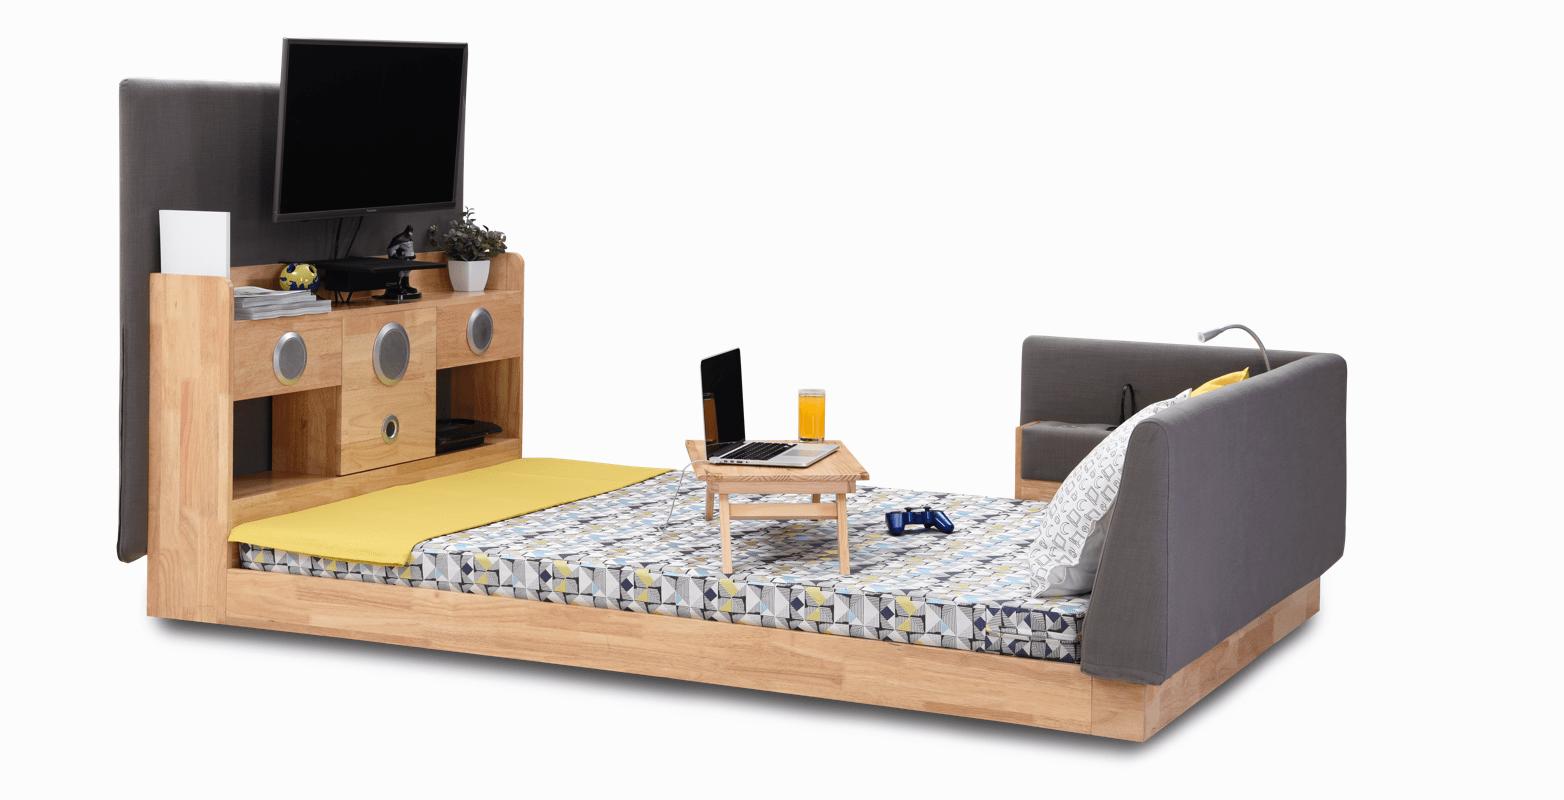 Sensational Award Winning Furniture On Rent Furlenco Home Remodeling Inspirations Genioncuboardxyz